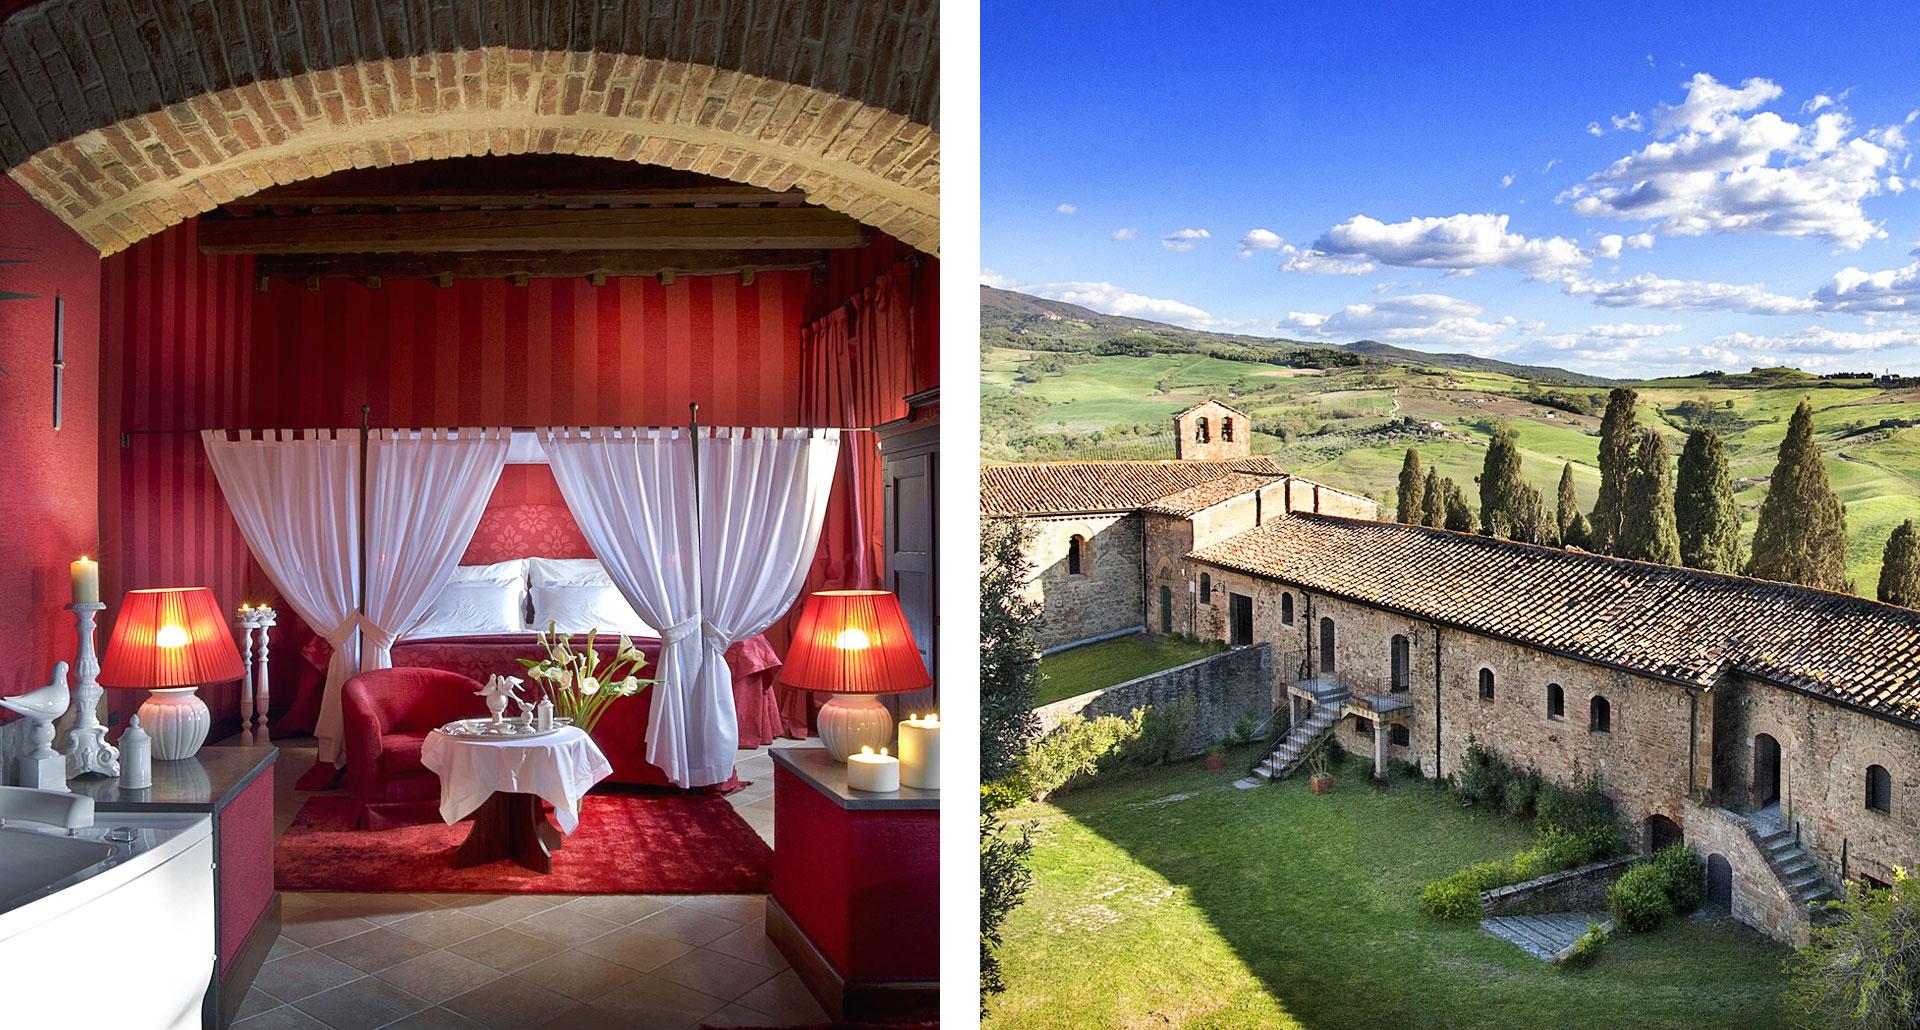 Castel Porrona Relais - luxury boutique hotel in Cinigiano